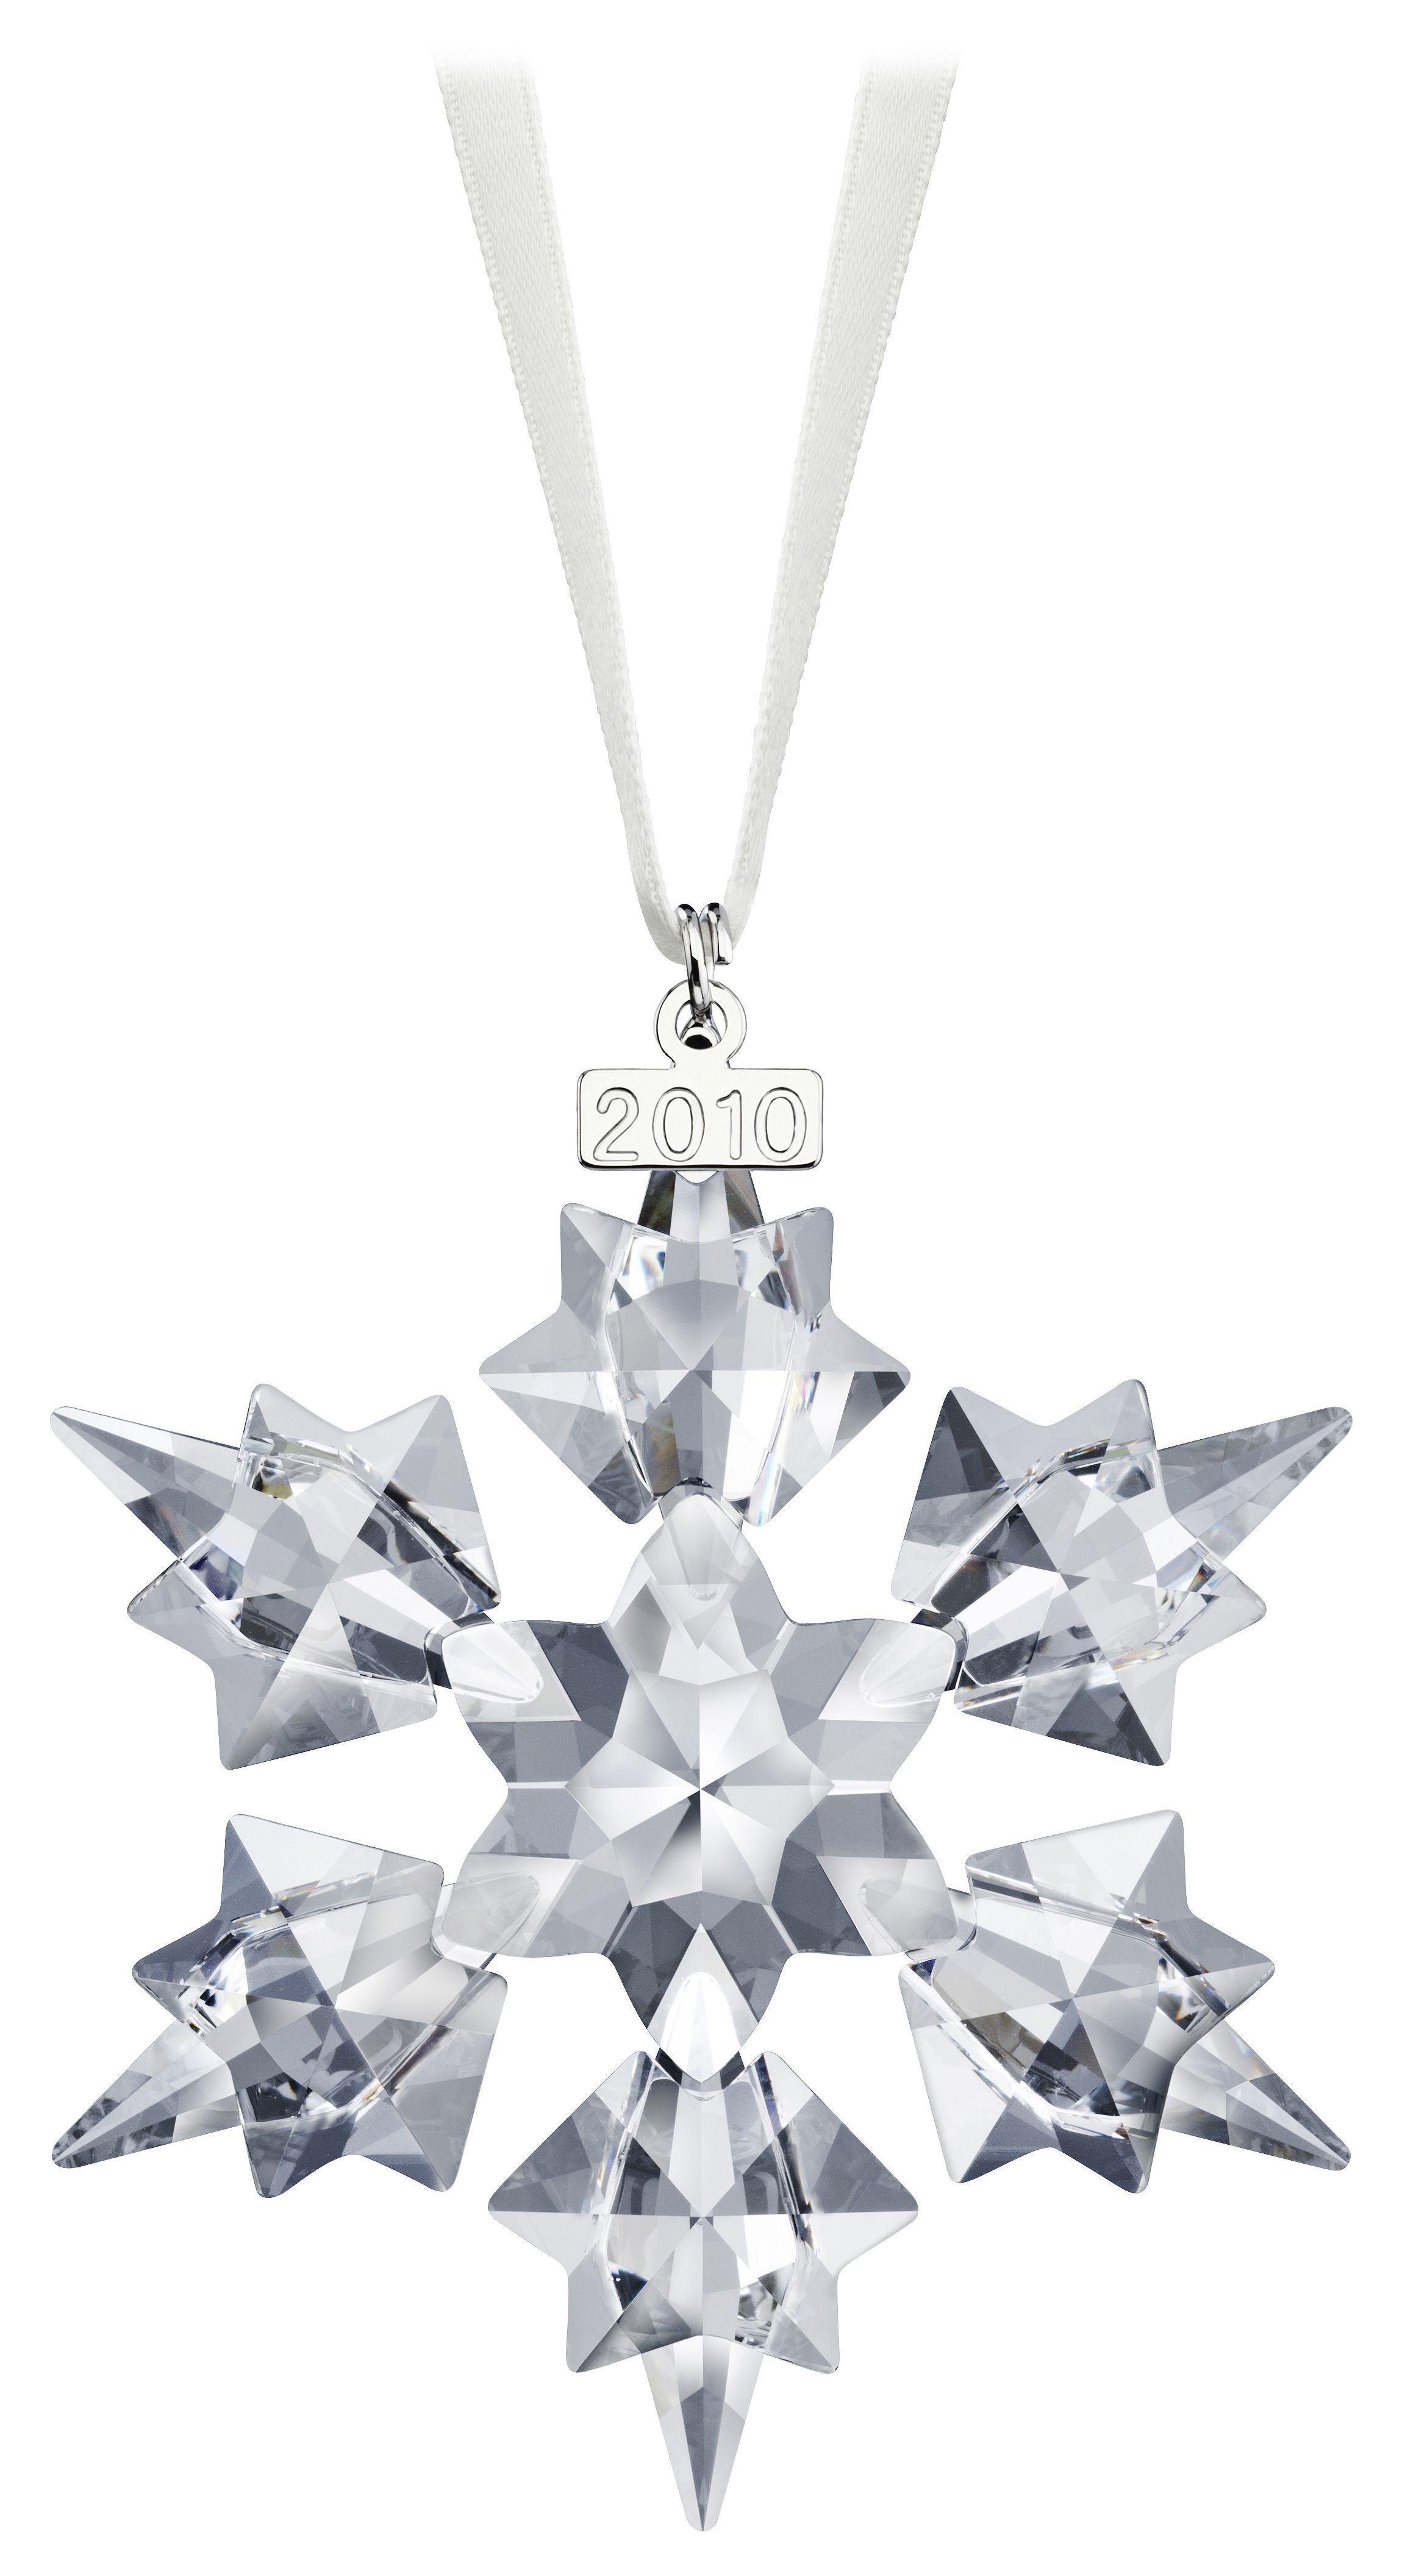 594817edd0c3 2010 - Snowflake